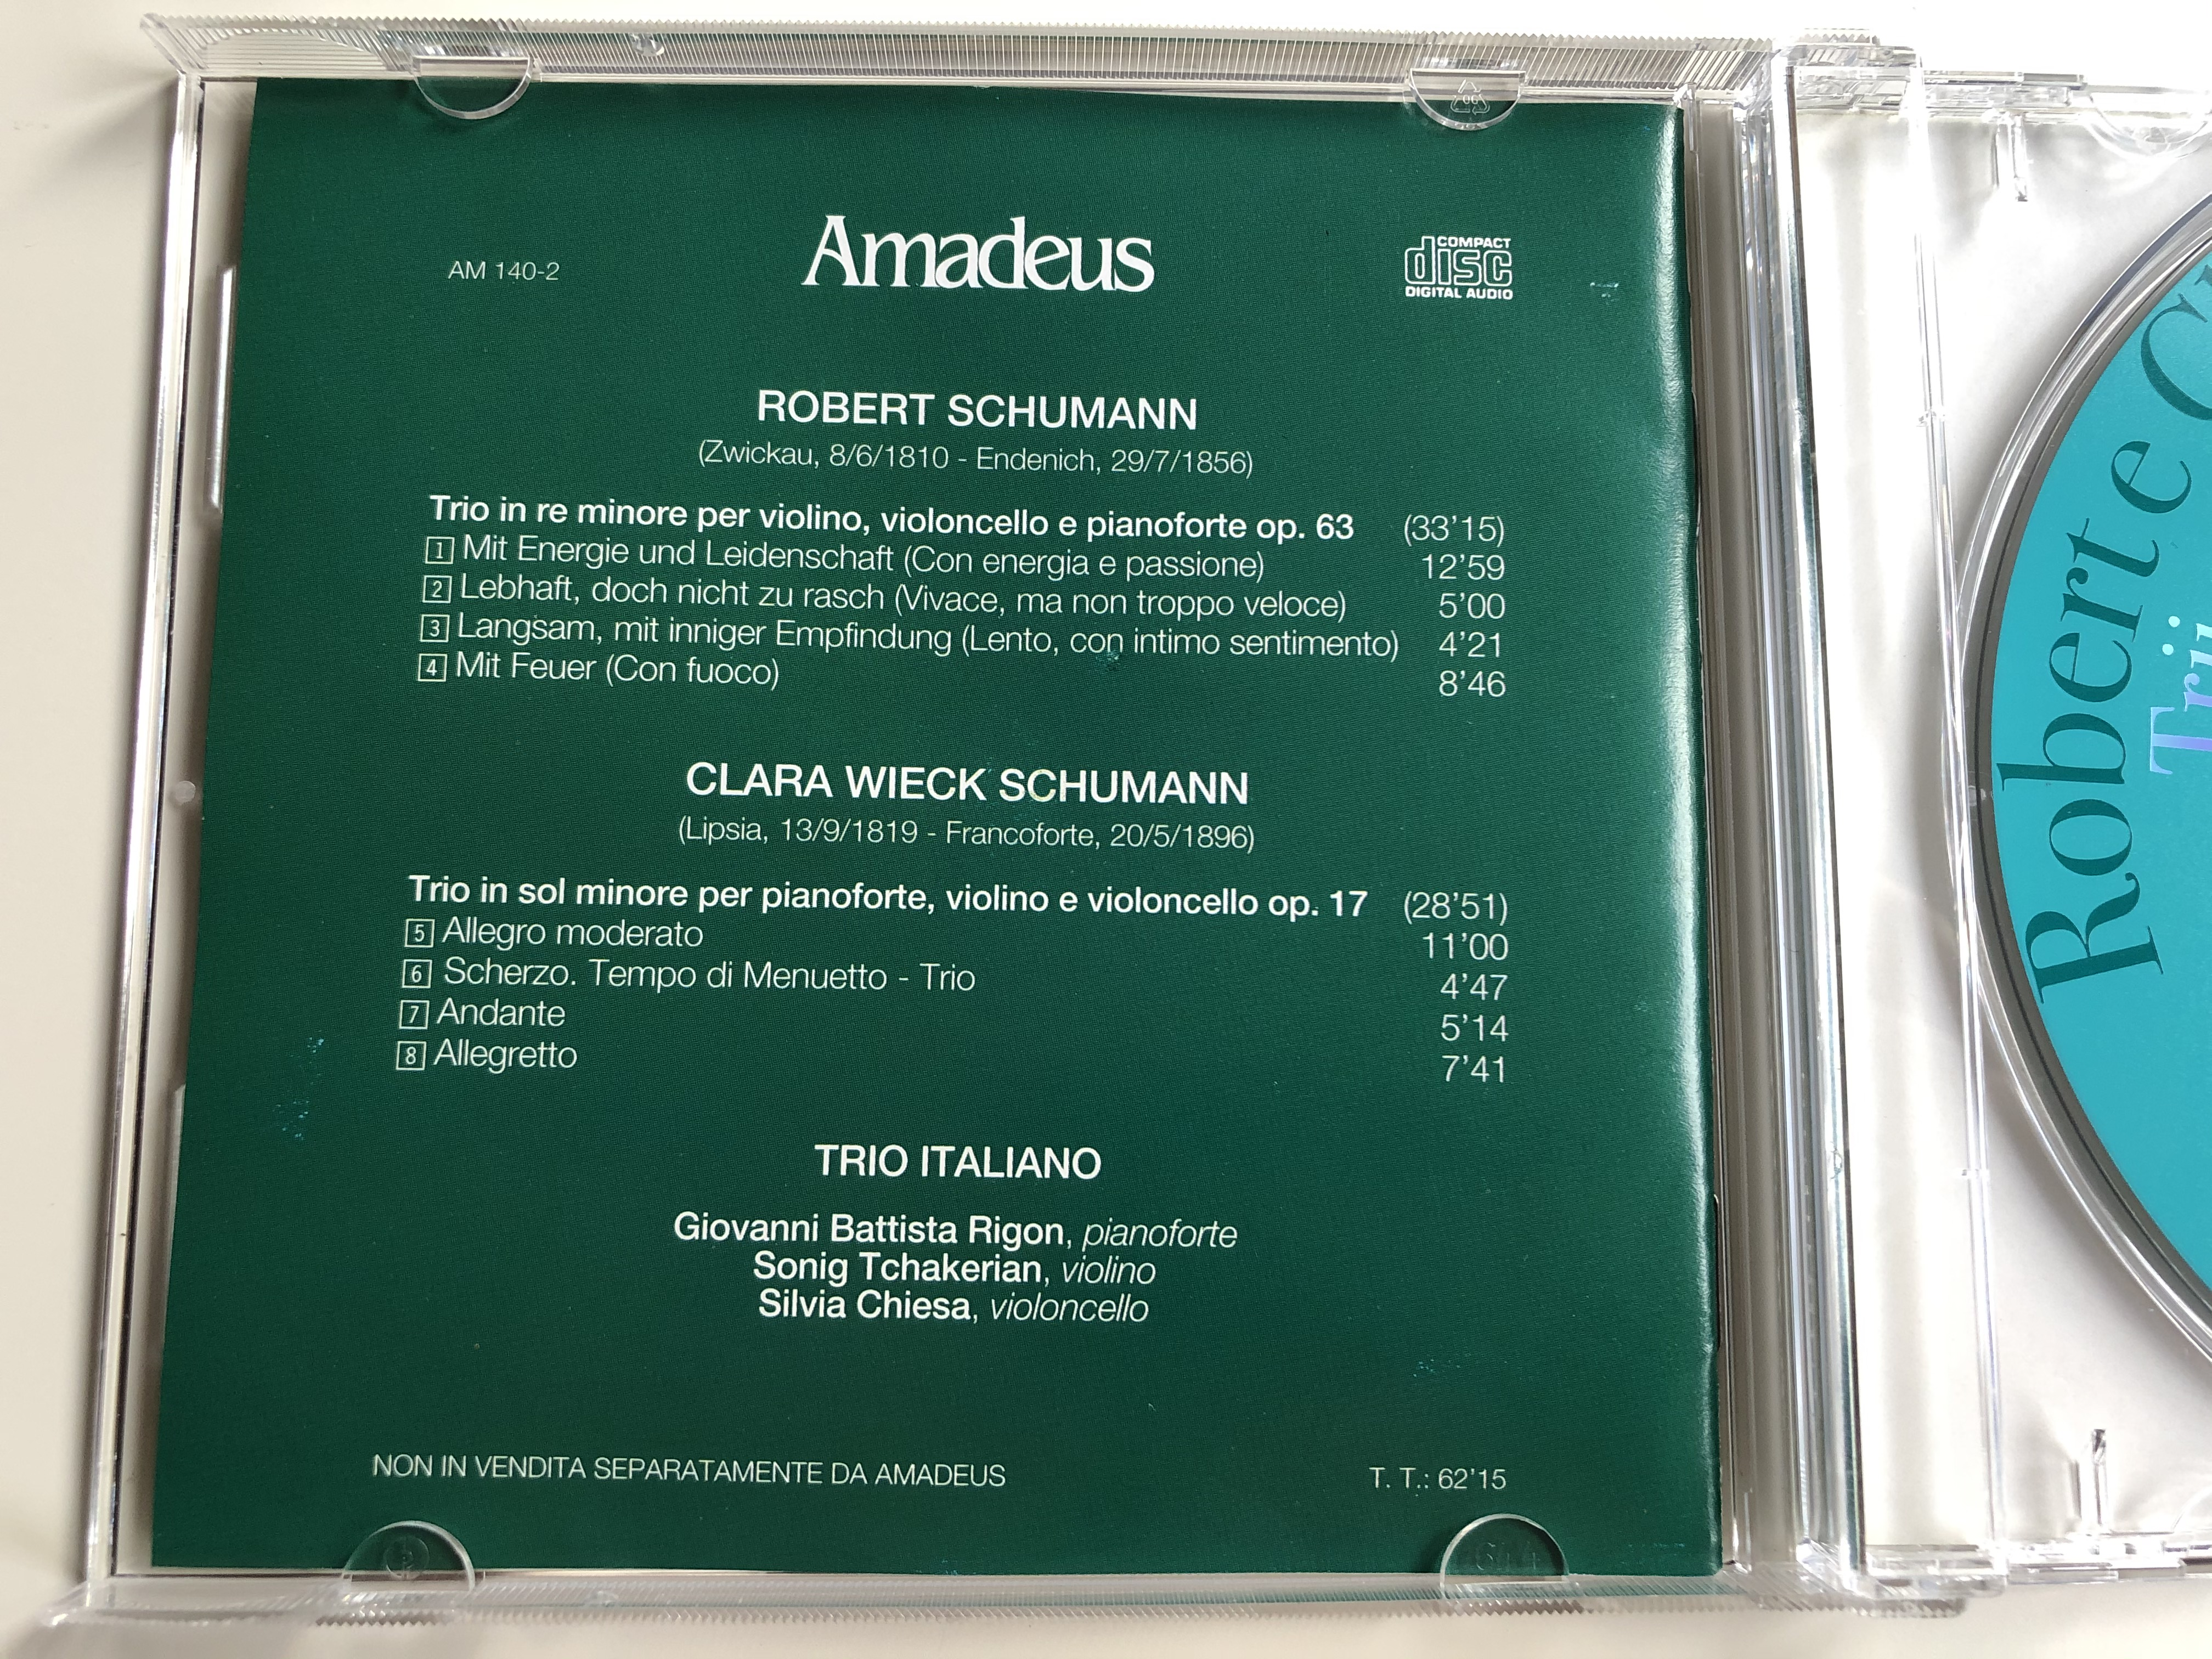 trii-per-pianoforte-e-archi-trio-italiano-robert-e-clara-schumann-amadeus-audio-cd-2001-am-140-2-8-.jpg